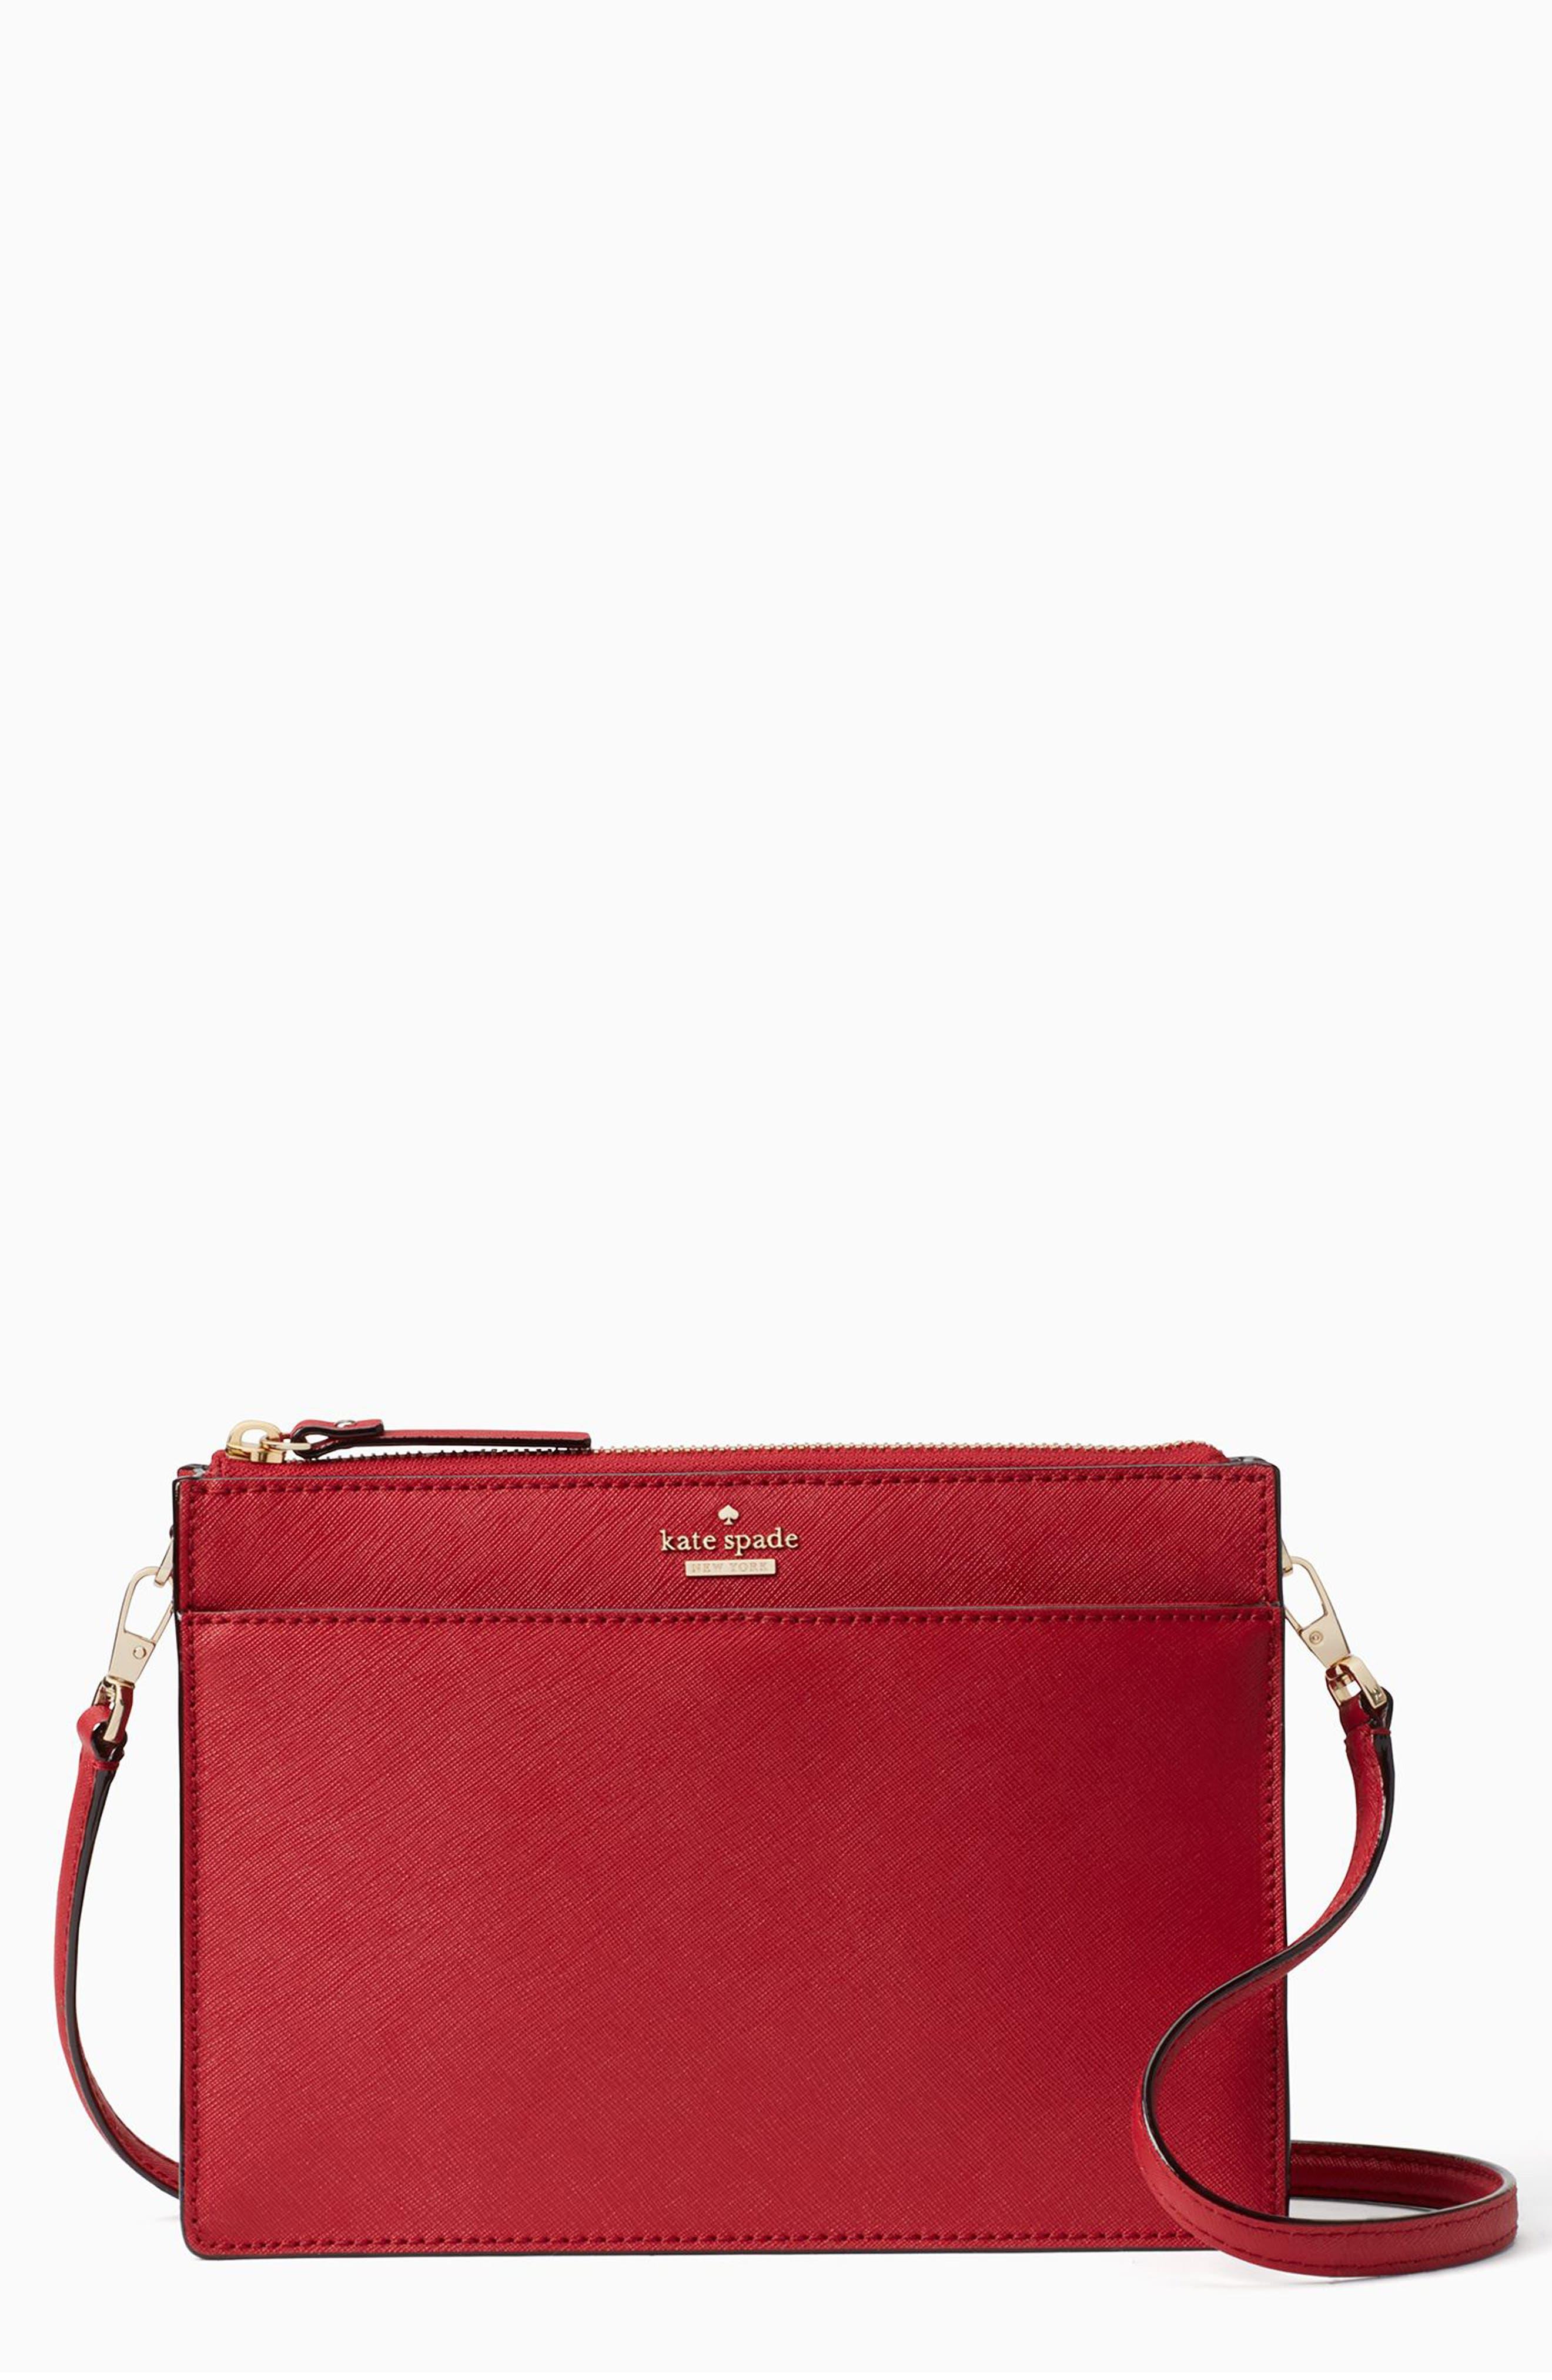 cameron street clarise leather shoulder bag,                         Main,                         color, SIENNA